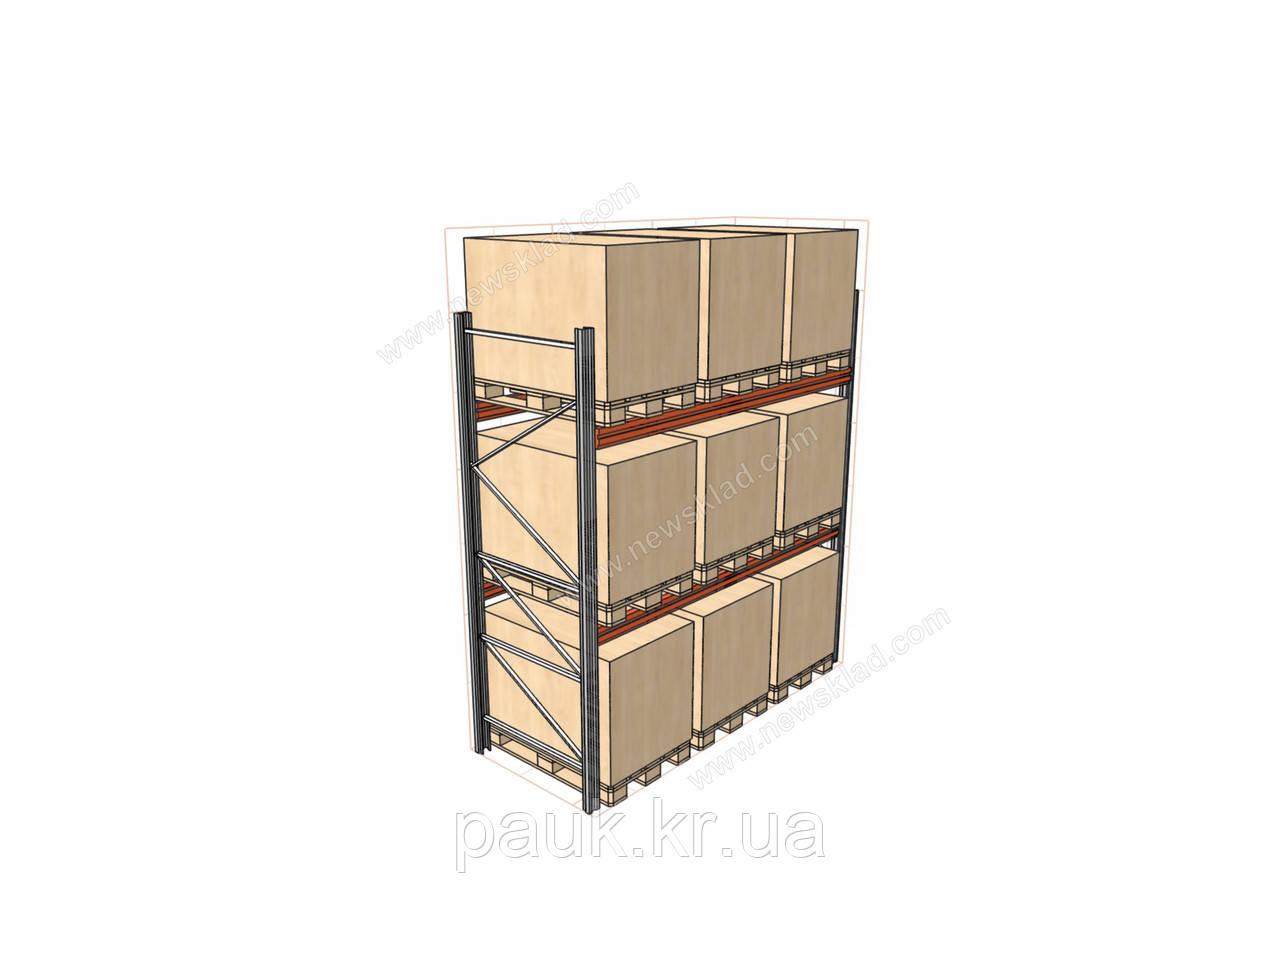 Стелаж для палет H4000хL2700х1100 мм(пол.+2 рівня по 3000 кг на рівень)